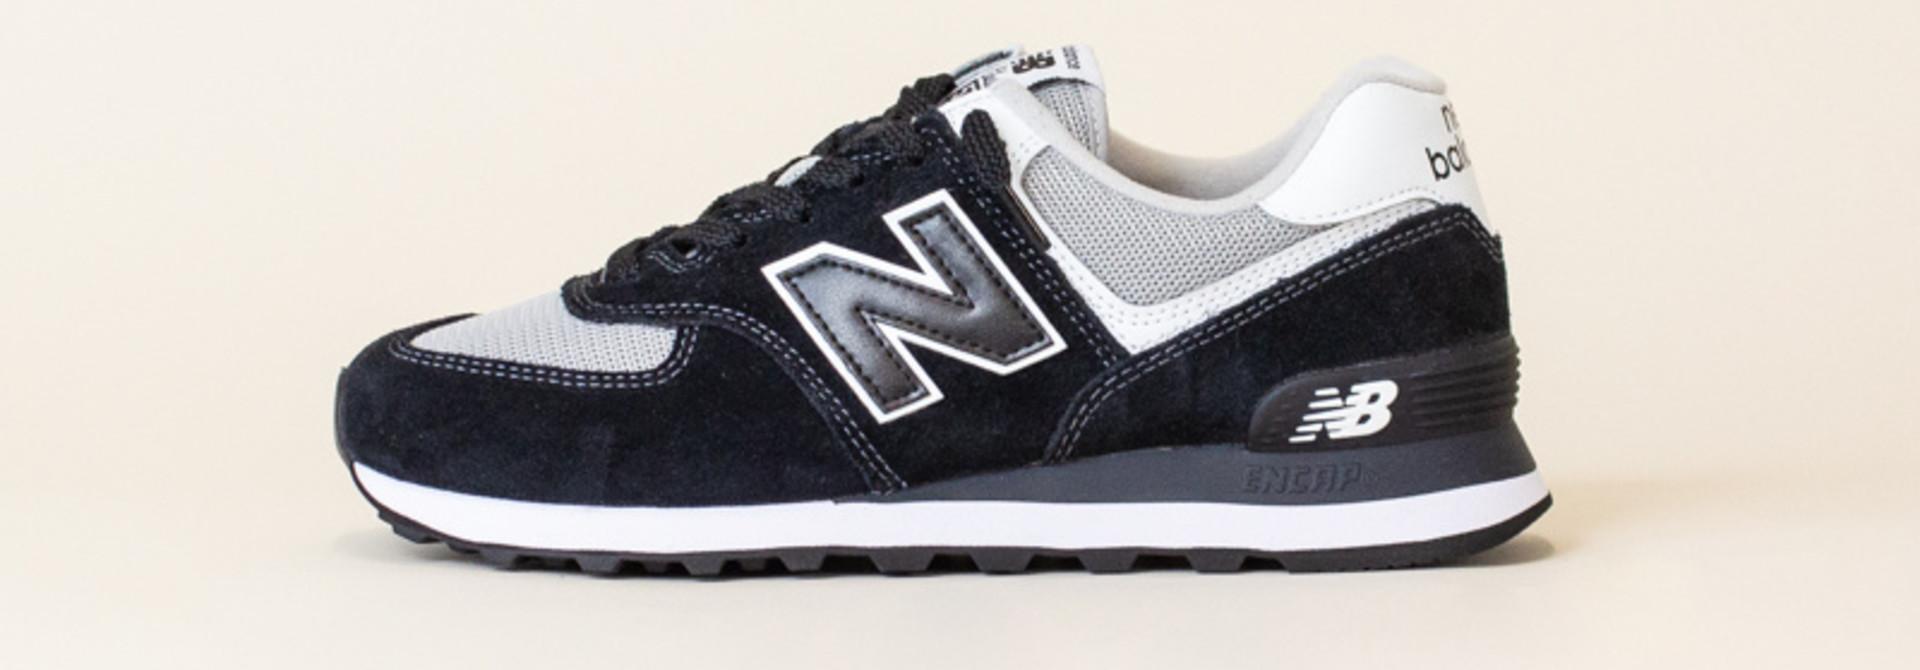 New Balance 574 SSN - Black/White